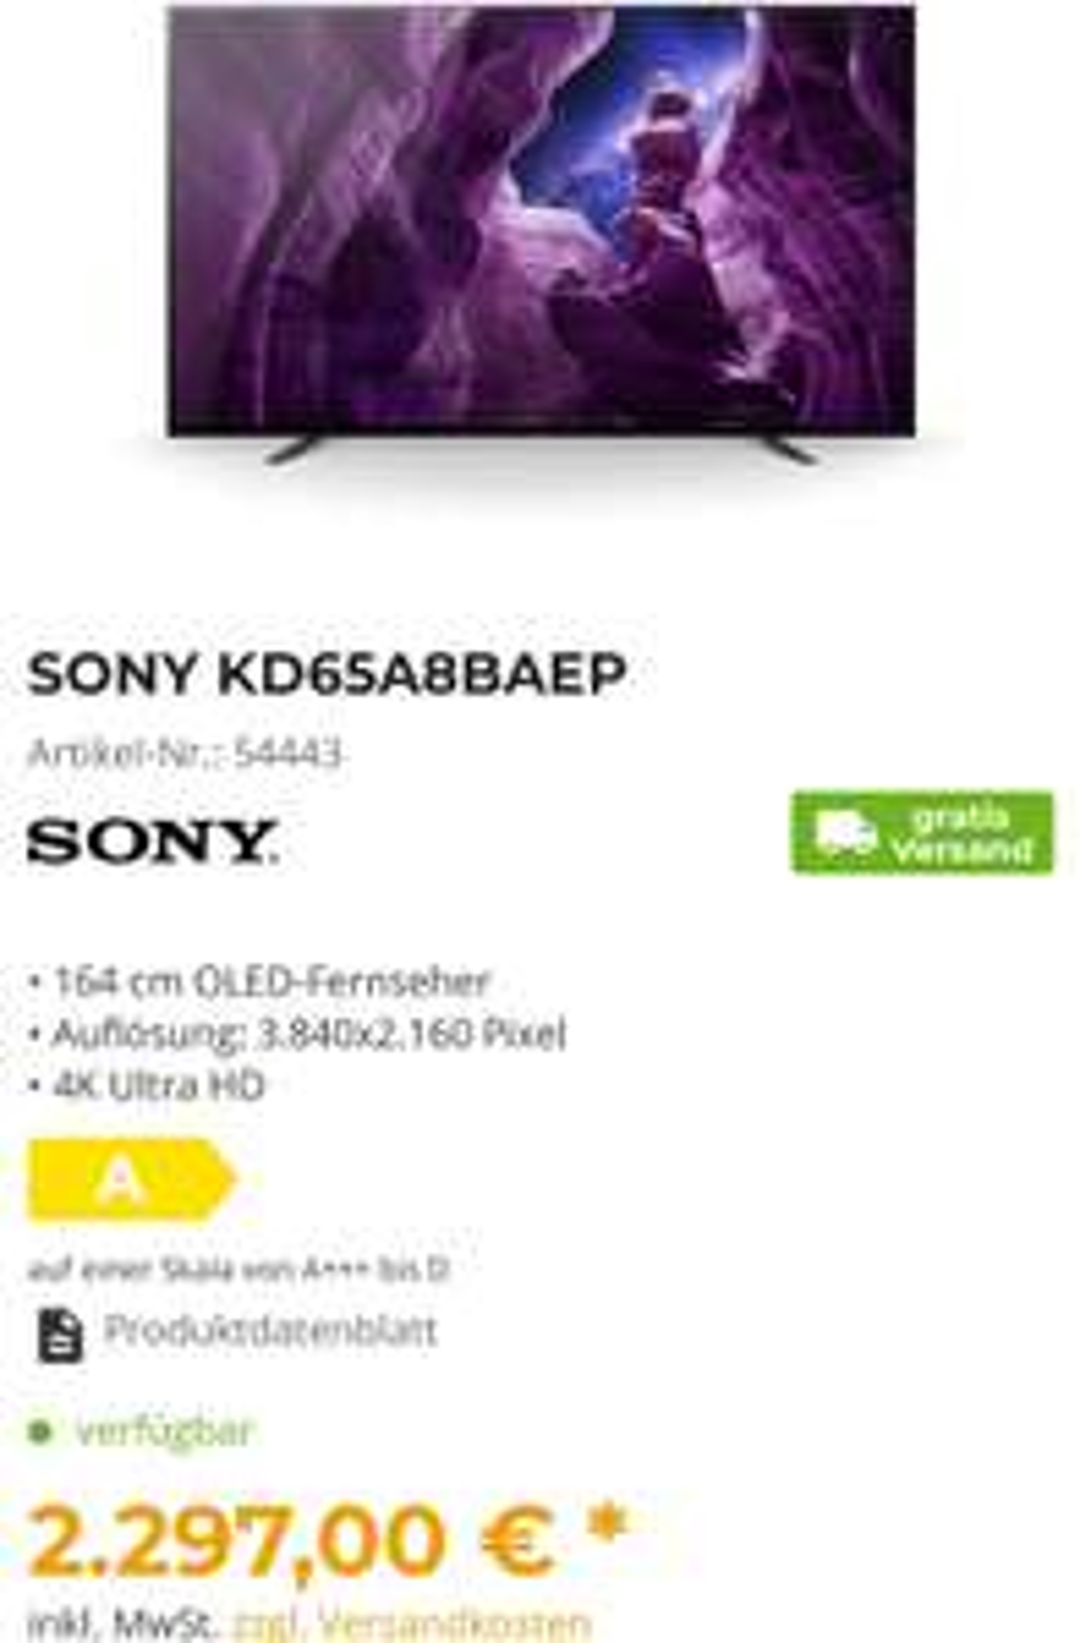 SONY KD65A8BAEP Oled Fernseher